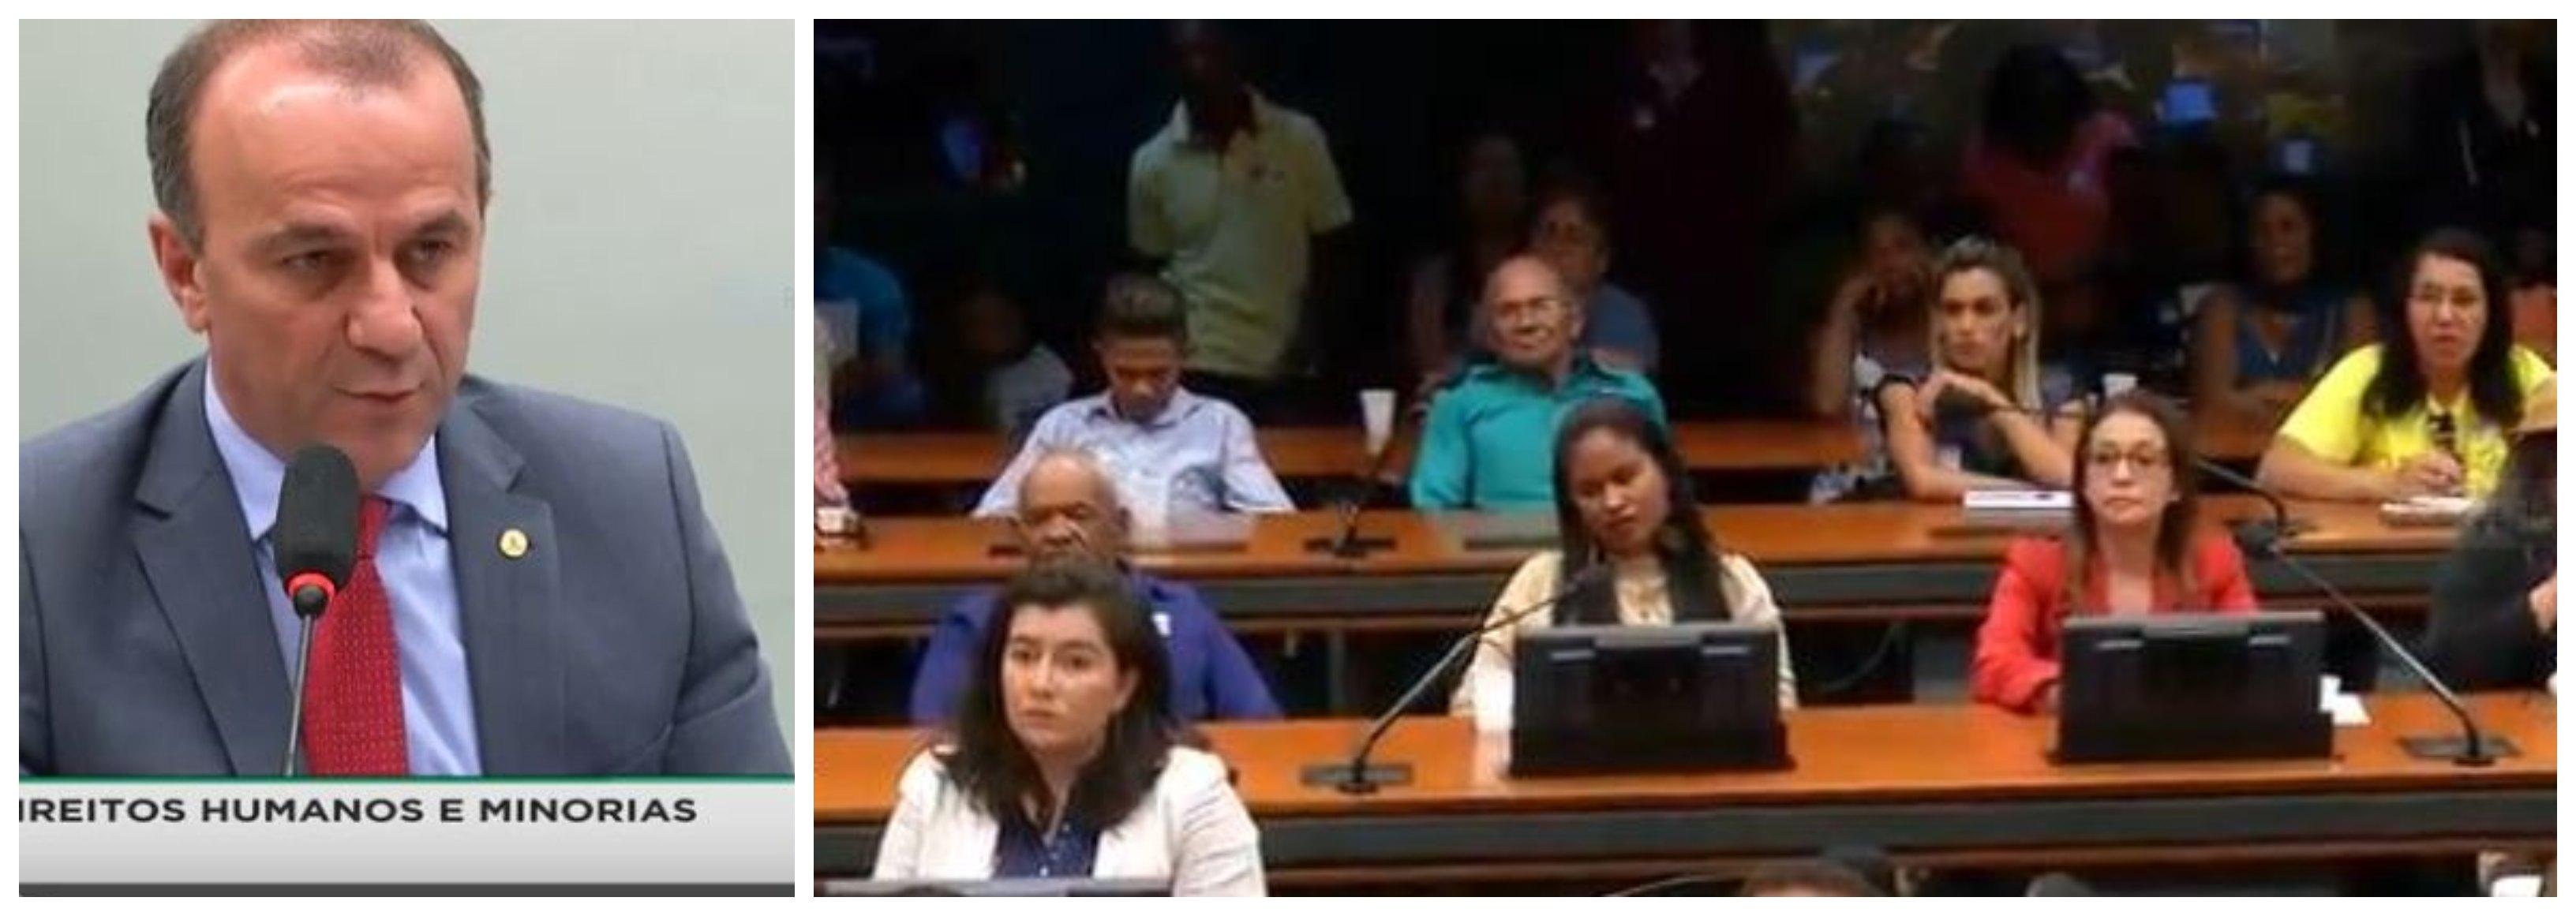 Direitos Humanos: Como foi o debate sobre a violência de grileiros contra comunidade de descendentes de Canudos na Bahia